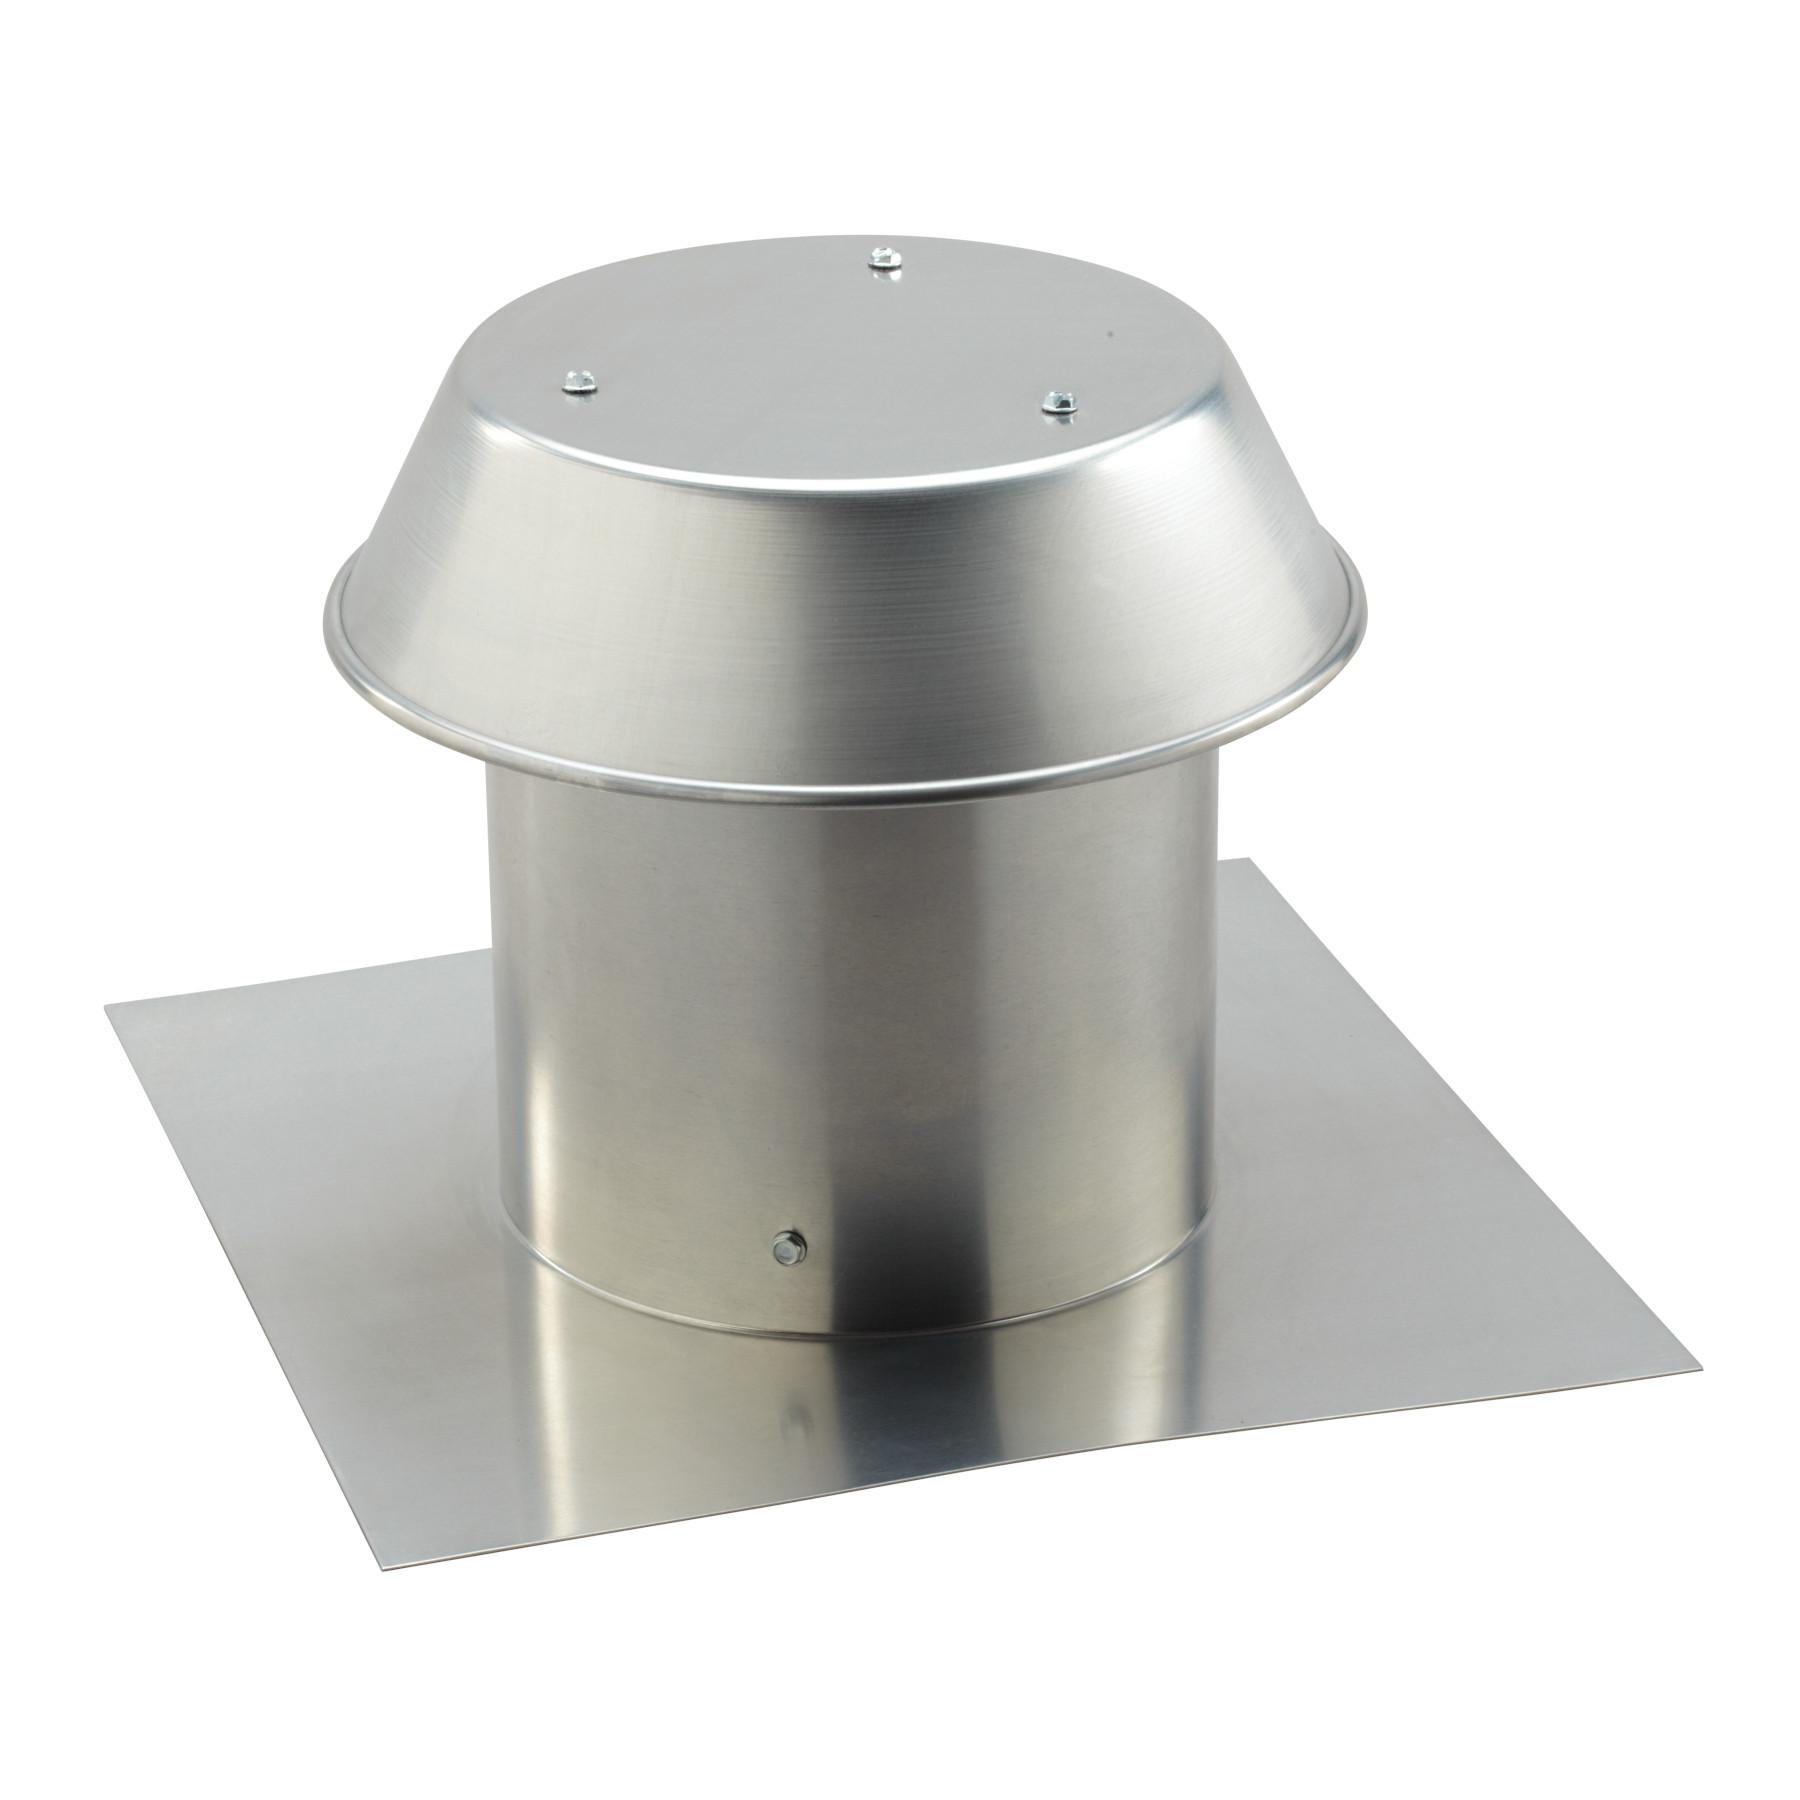 8 inch roof cap for flat roof aluminum